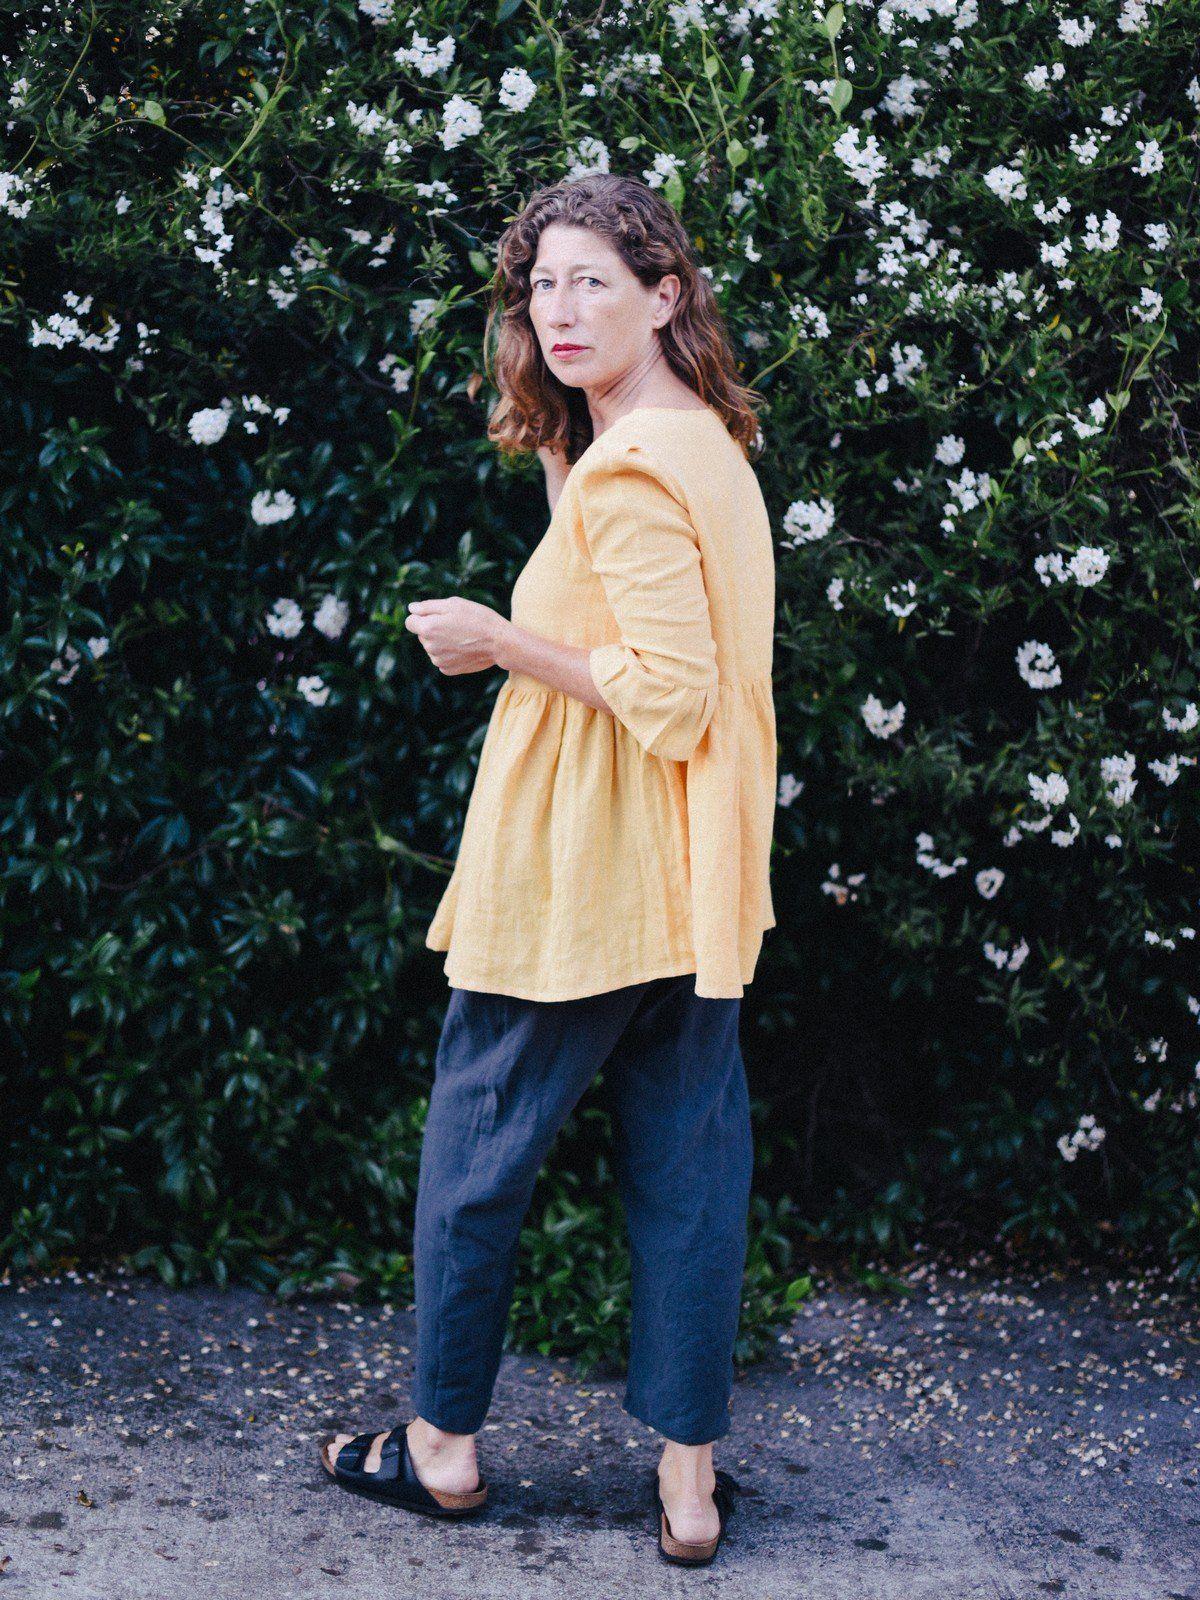 Pantalon De Lino Mujer Con Elastico 100 Lino Lavado Ecologico Fieito